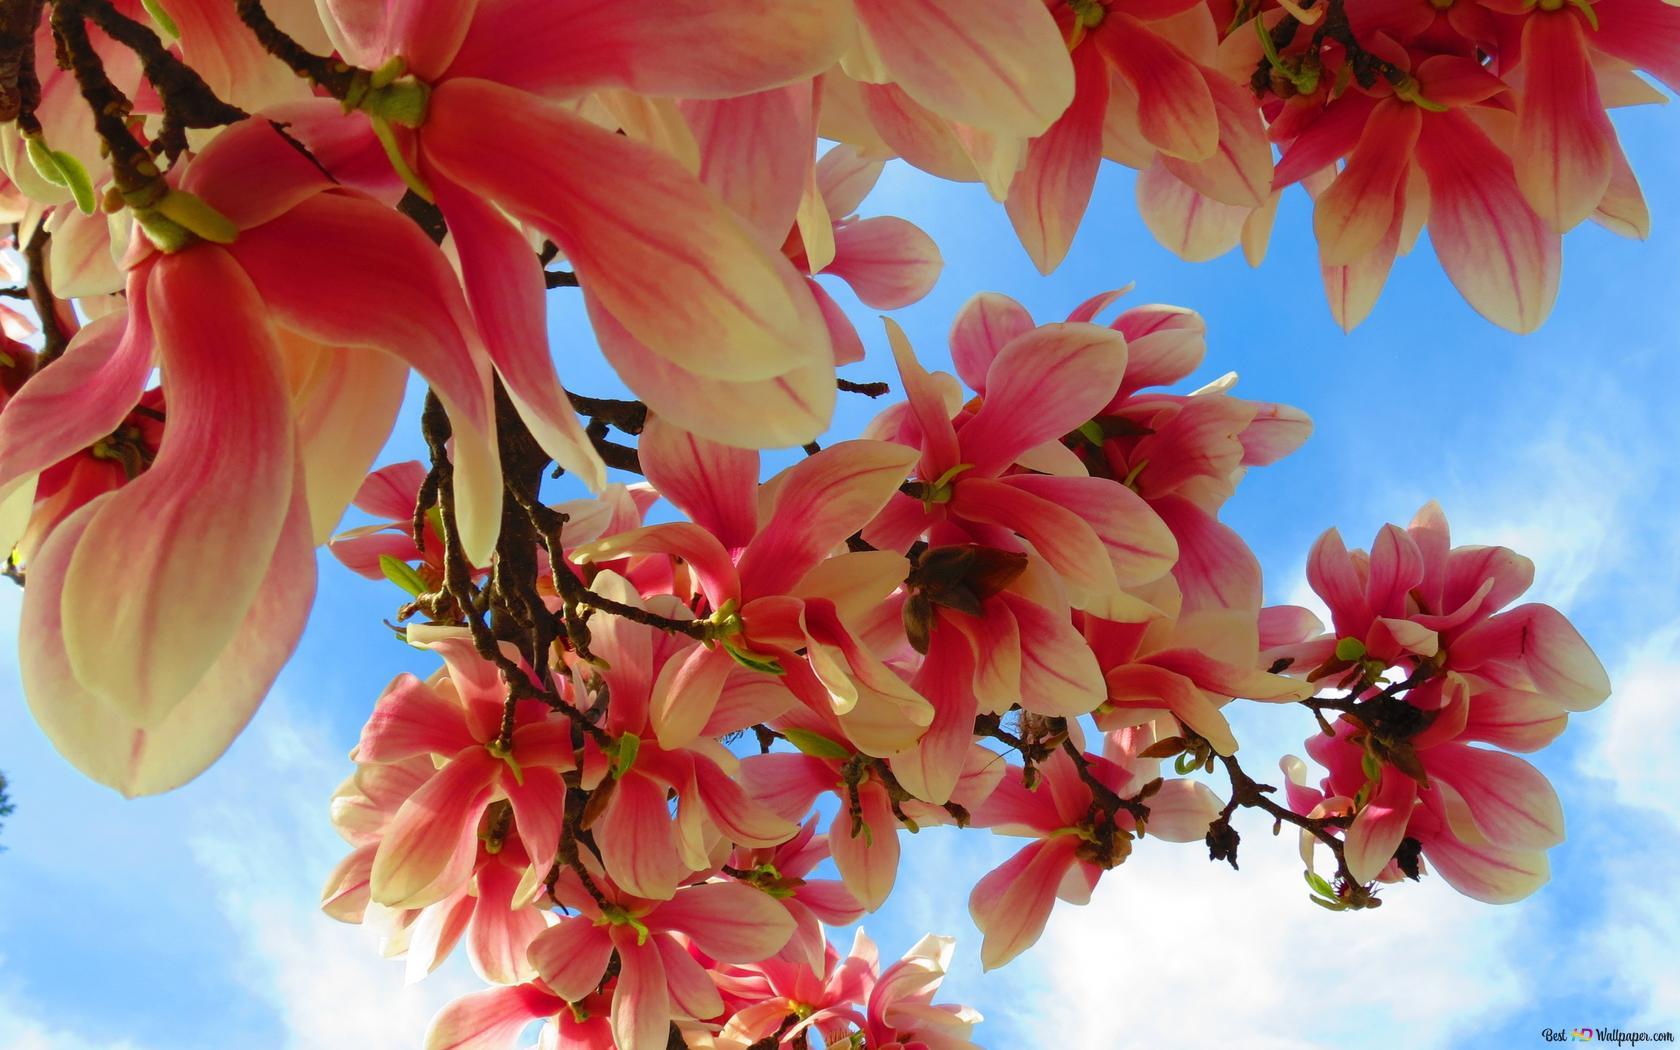 Fond De Printemps Fleurs Roses Hd Fond D Ecran Telecharger